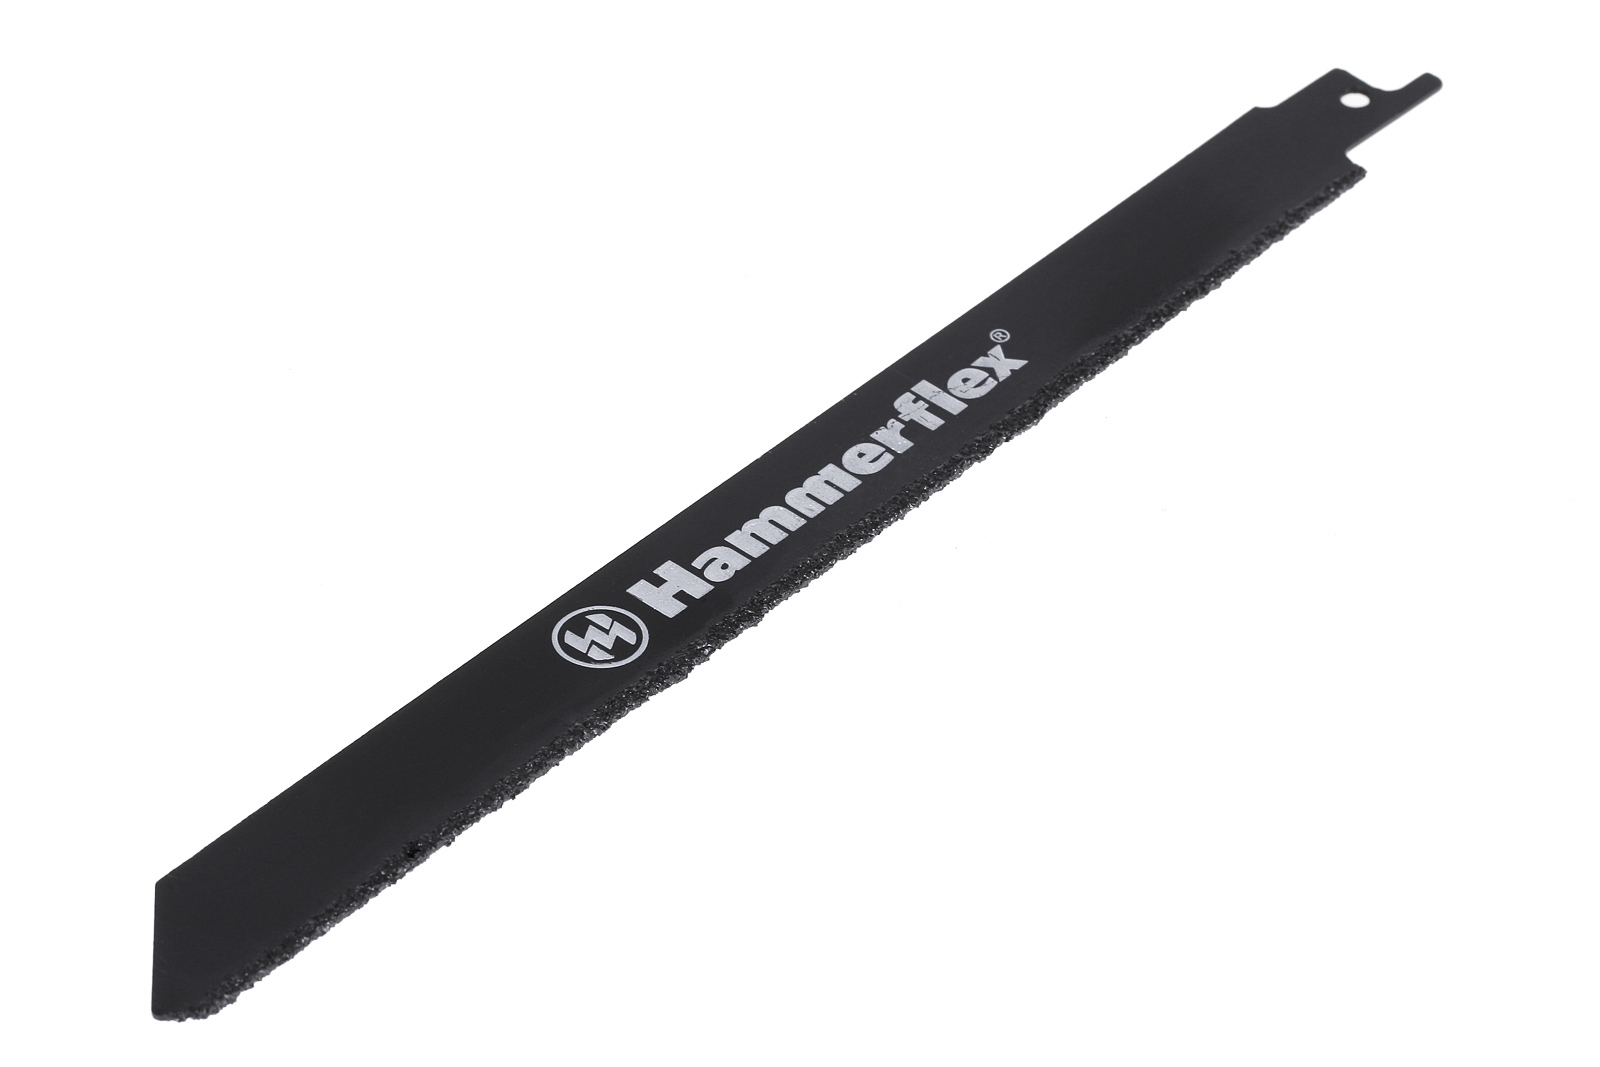 Полотно для сабельной пилы Hammer 225-203 rs bl 203 228х25,4х1.60 мм 203 polygran